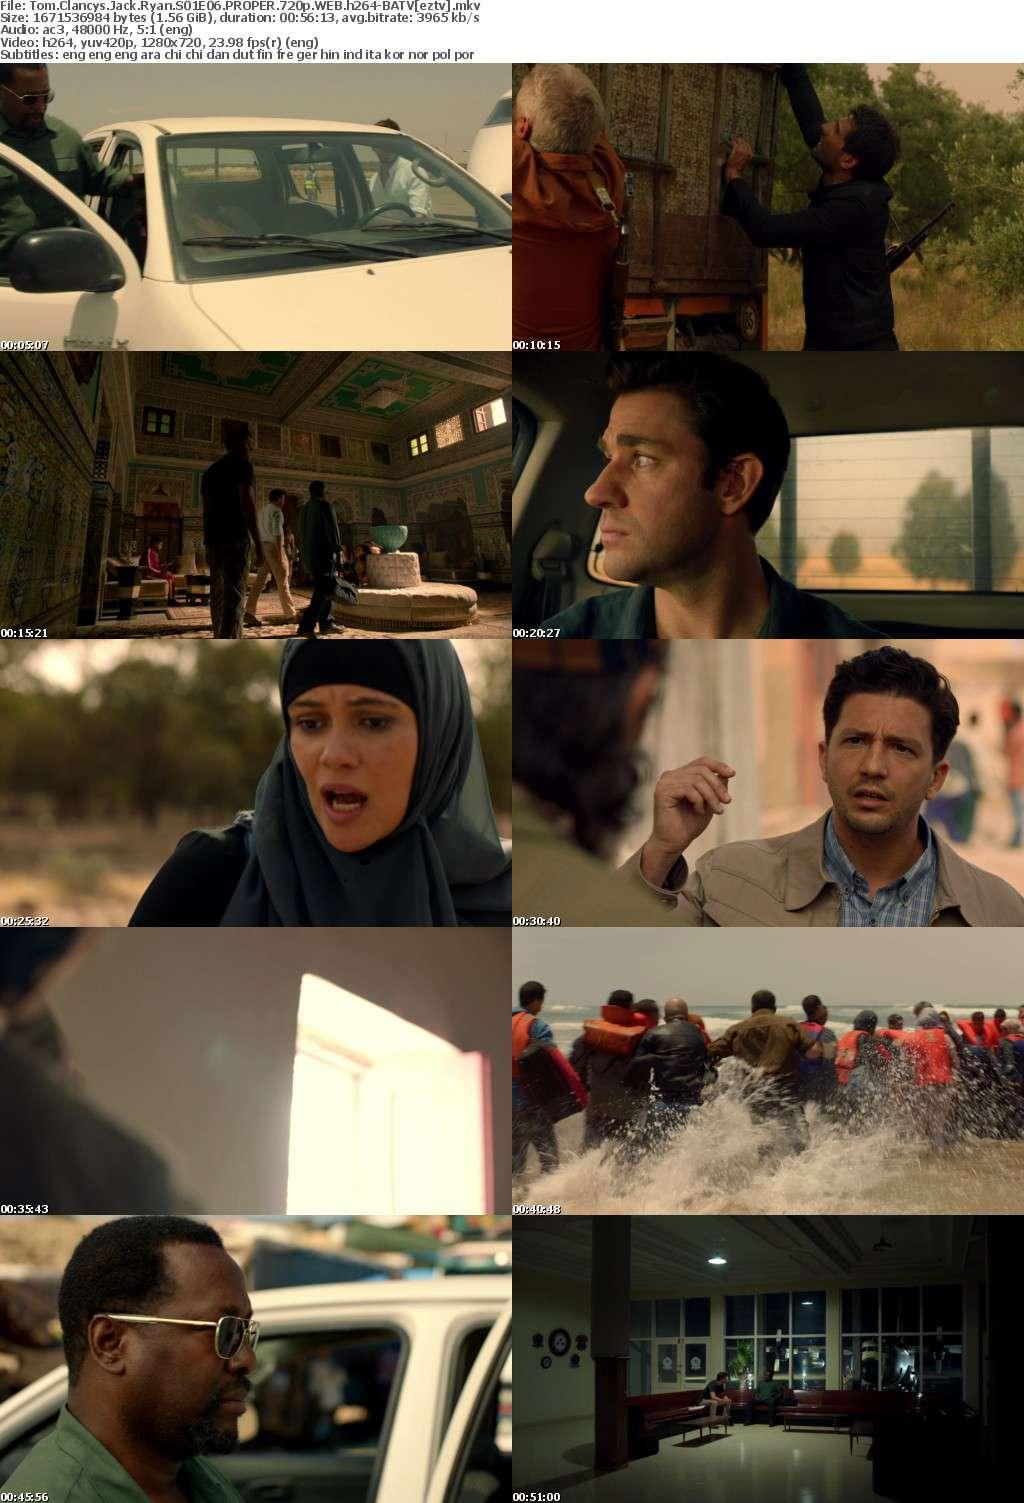 Tom Clancys Jack Ryan S01E06 PROPER 720p WEB h264-BATV